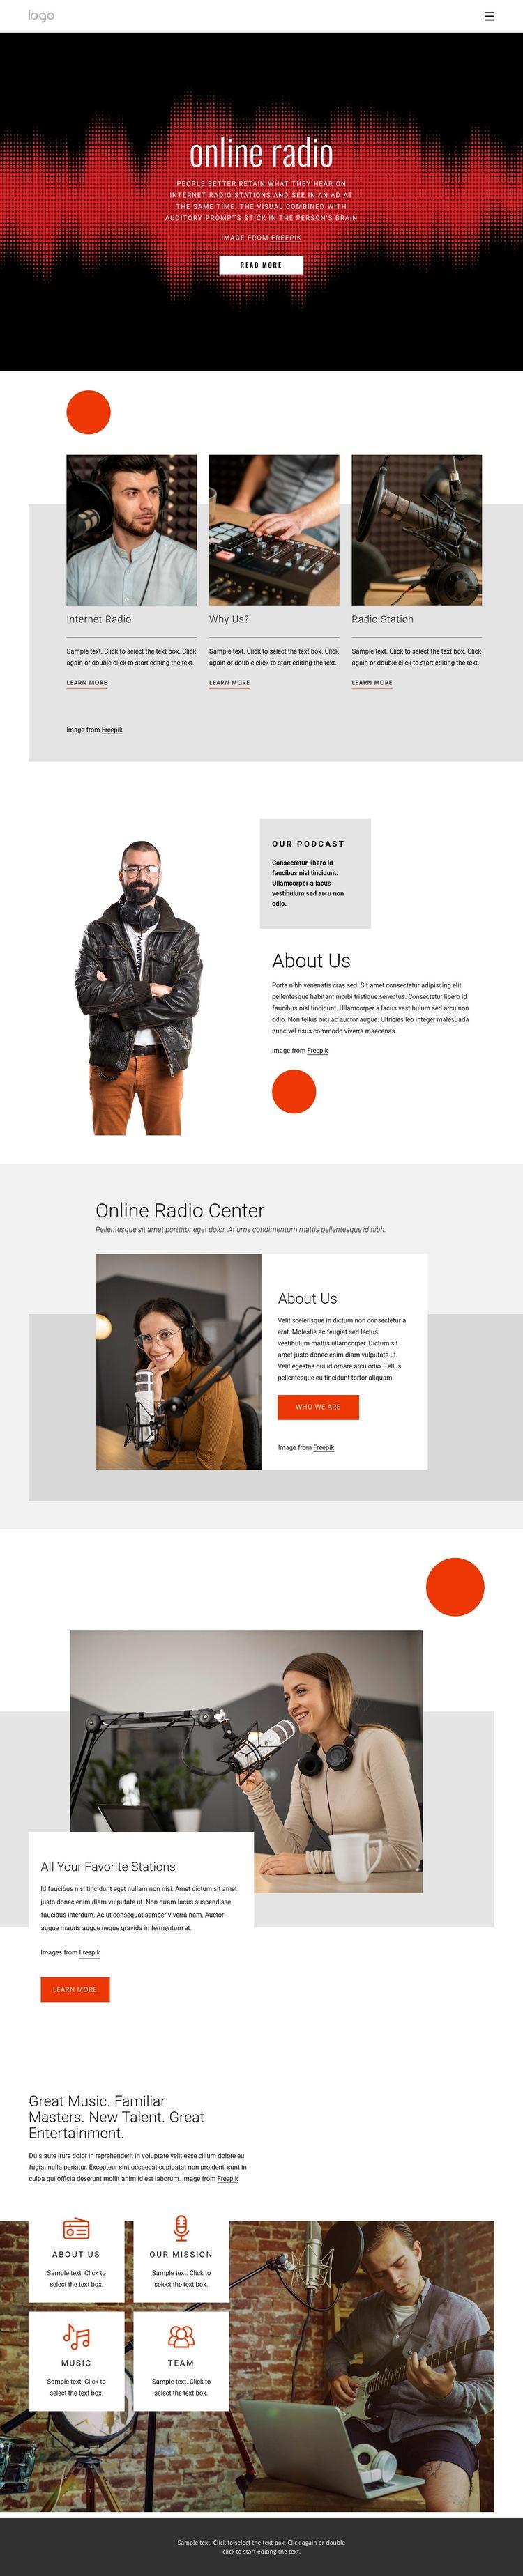 Online radio shows Web Page Design